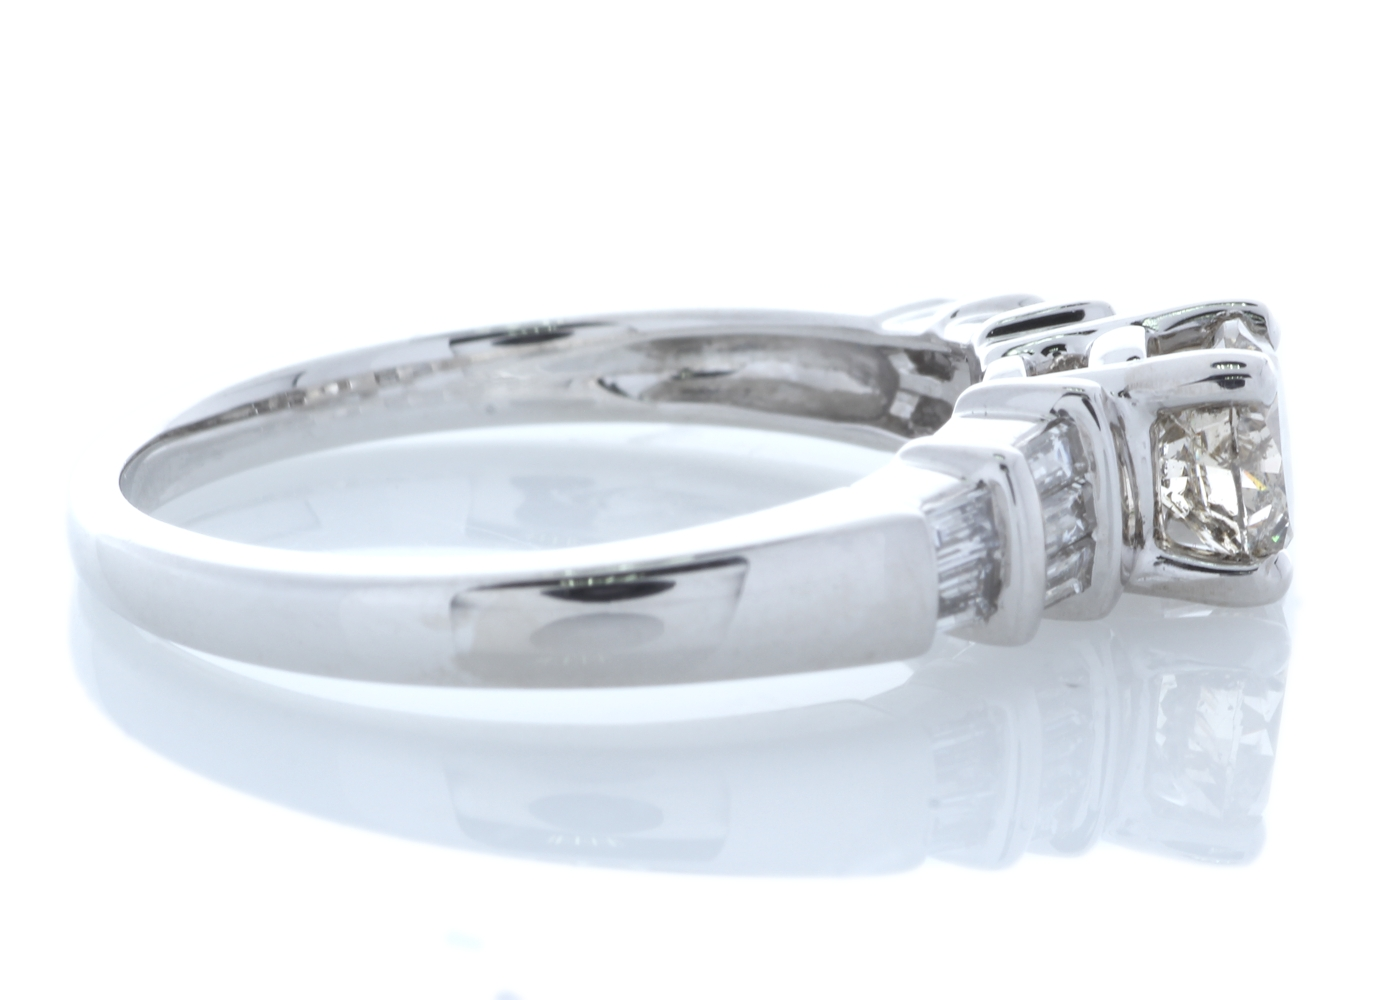 Lot 24 - 18ct White Gold Single Stone Prong Set With Stone Set Shoulders Diamond Ring 0.84 Carats